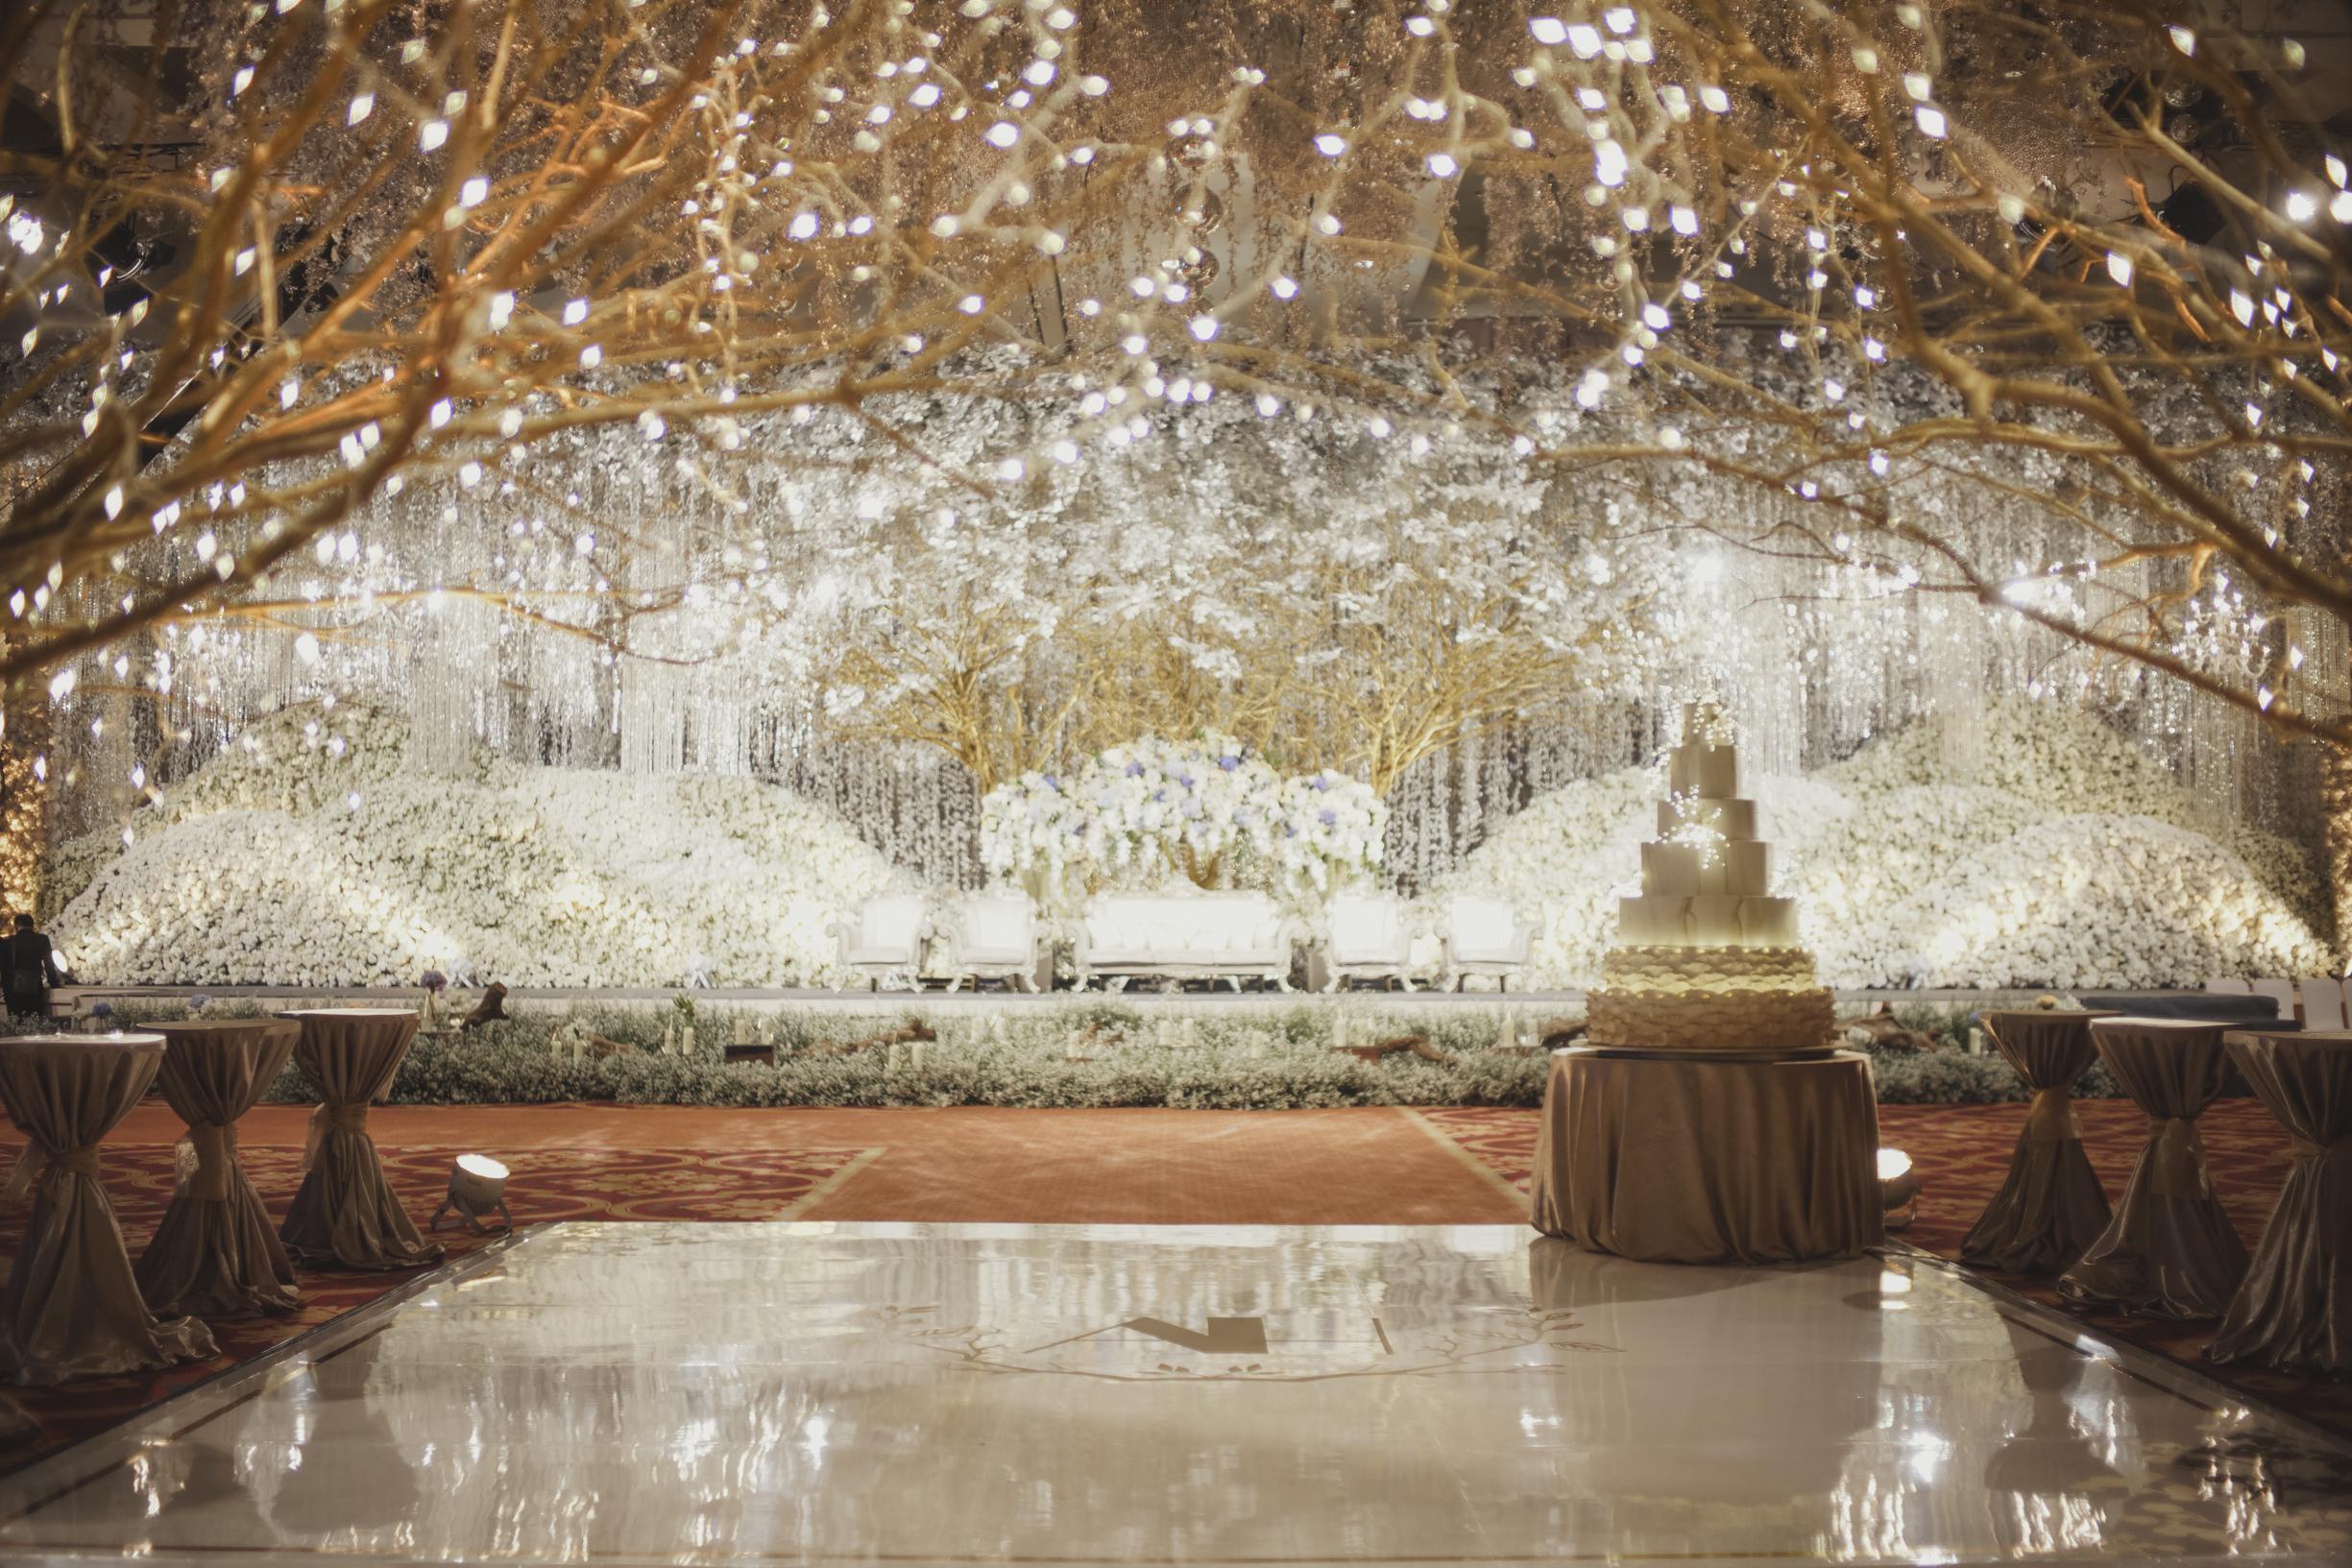 The Bridestory Blog's 17 Most Favorite Real Weddings of 2017 Image 7